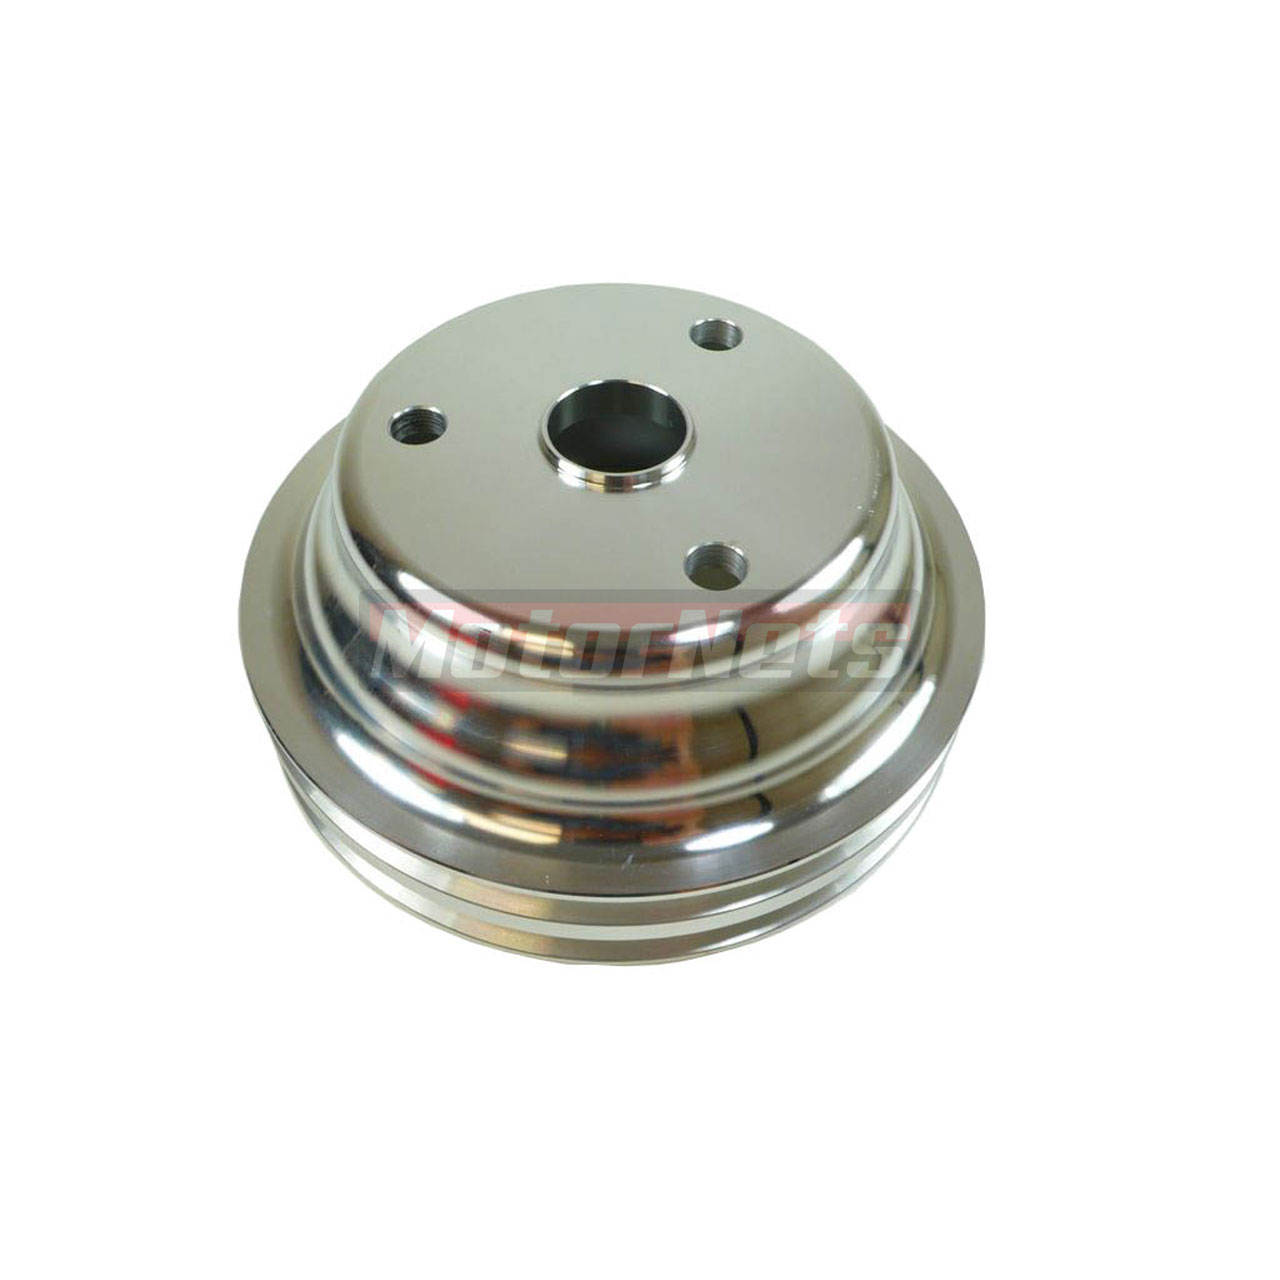 SB Chevy Aluminum Crankshaft Pulley 2 Groove LWP Long